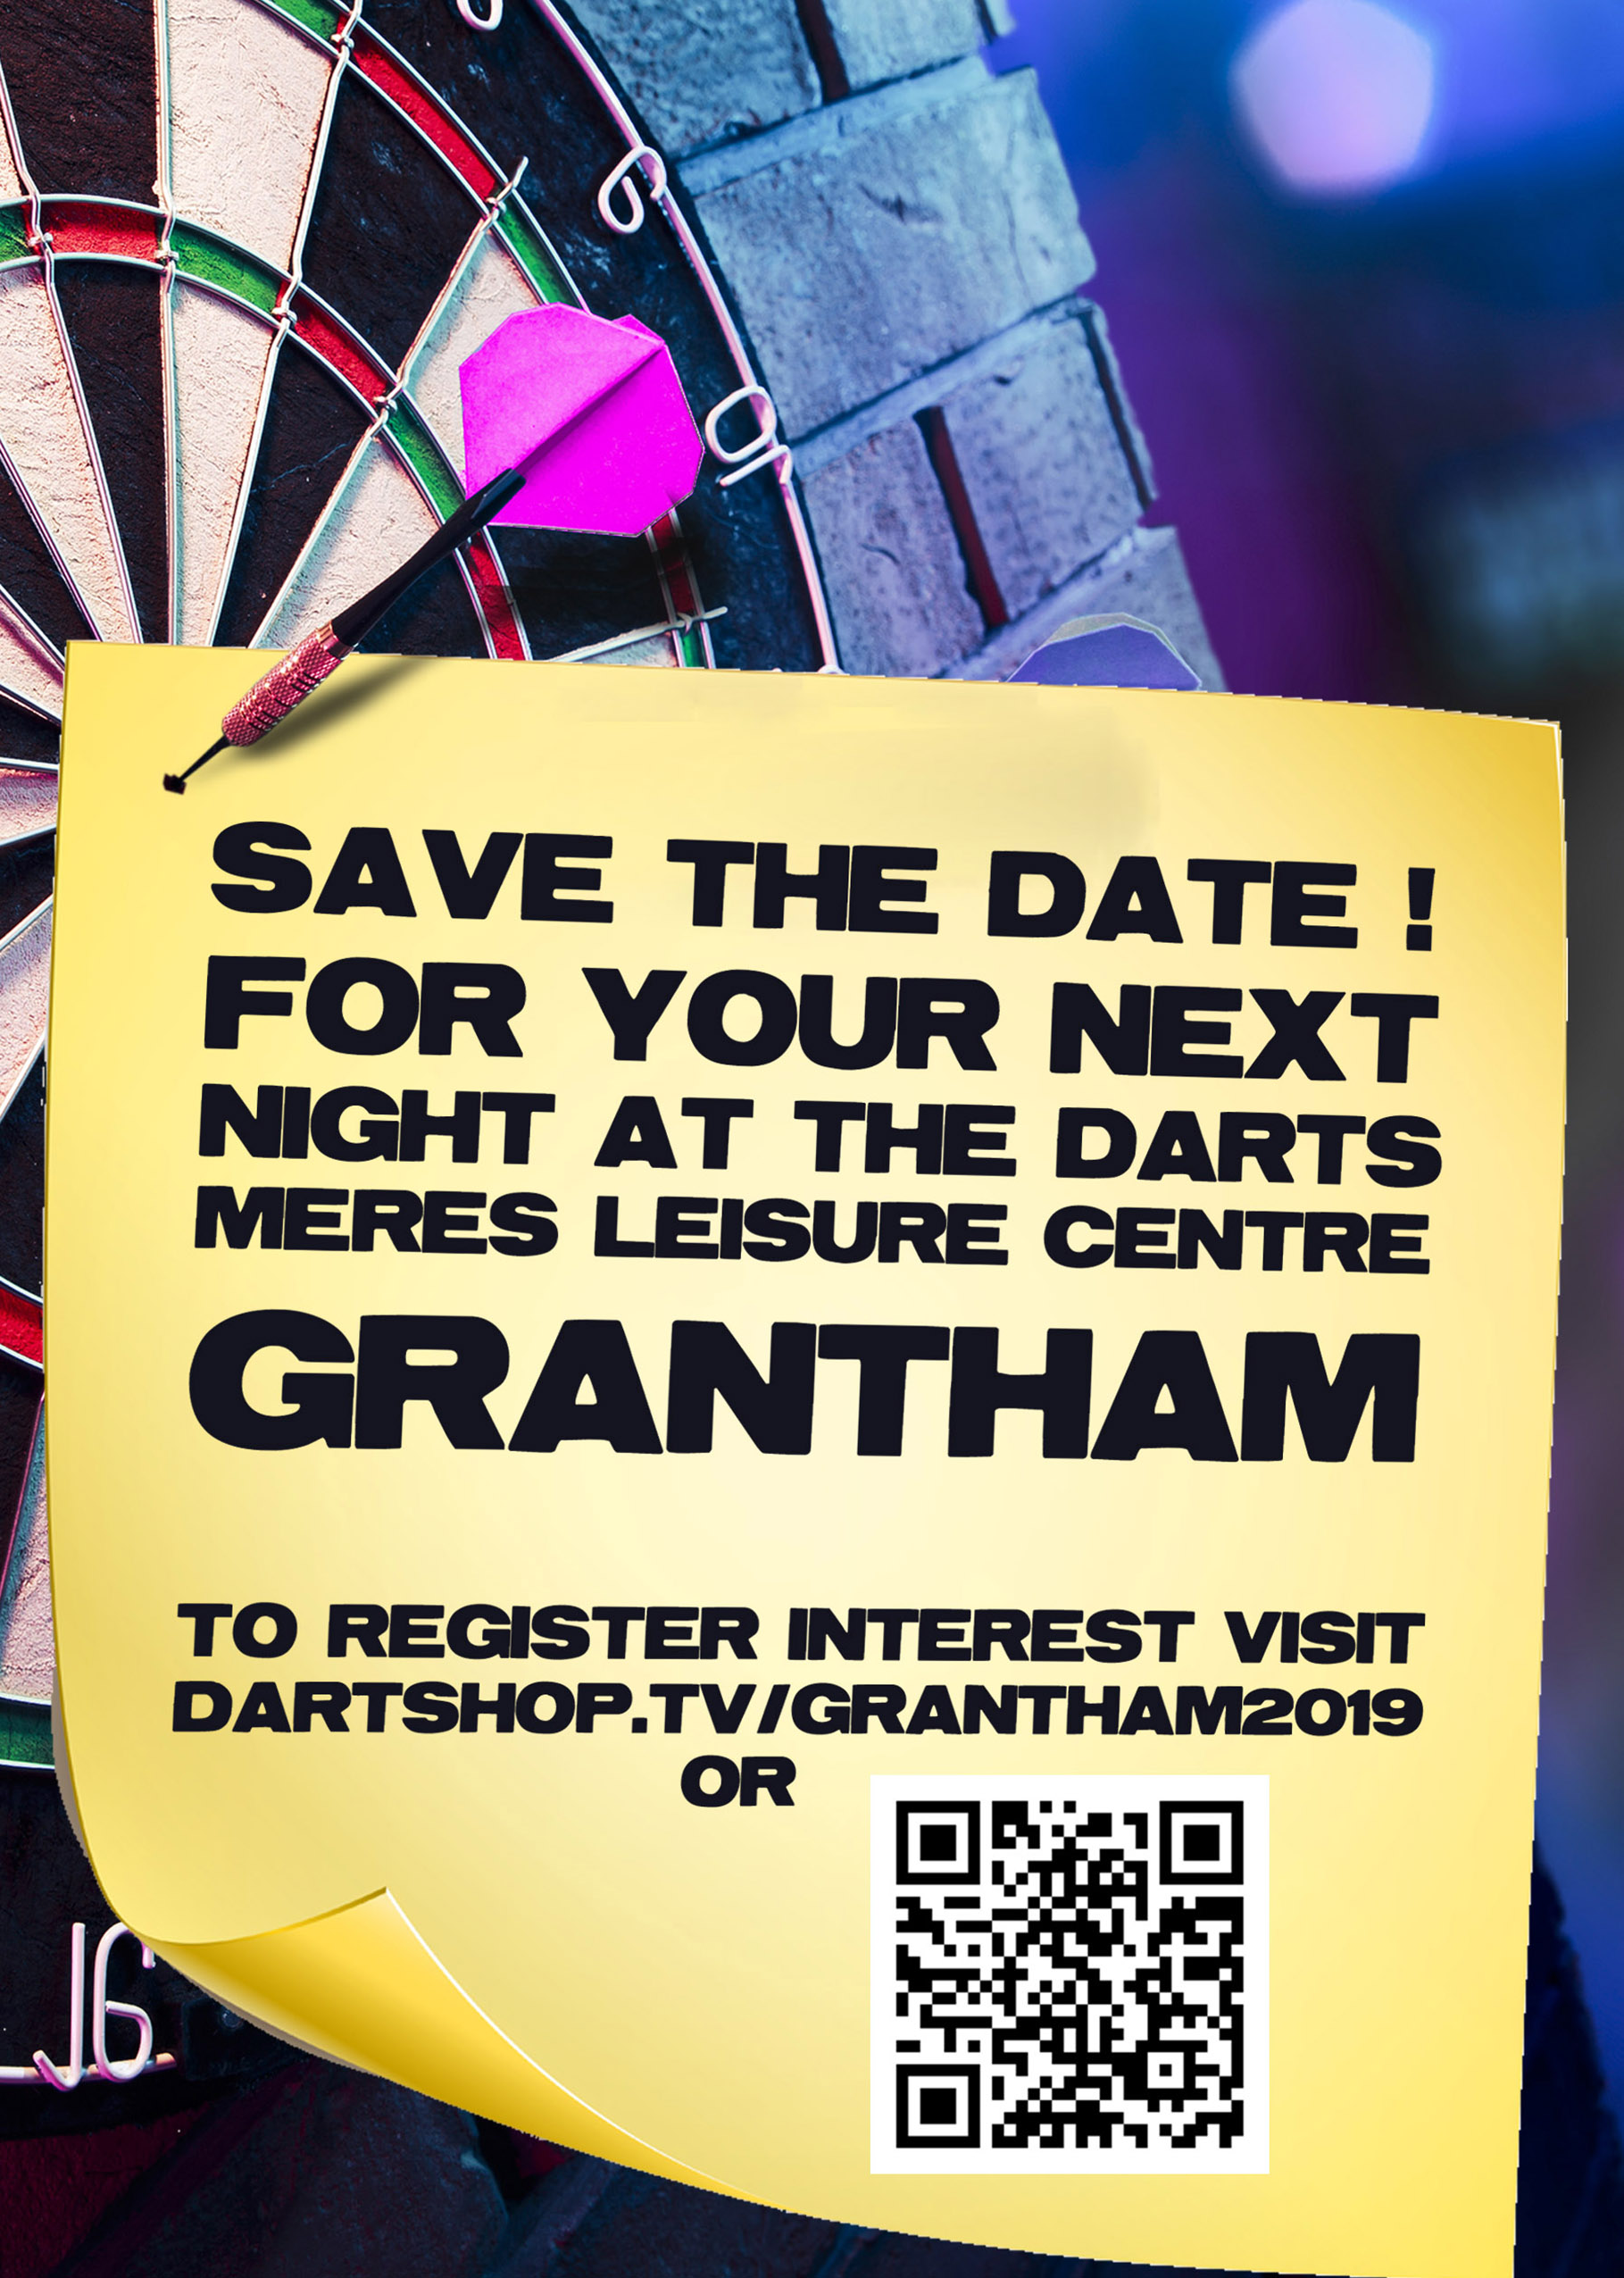 Grantham dating site